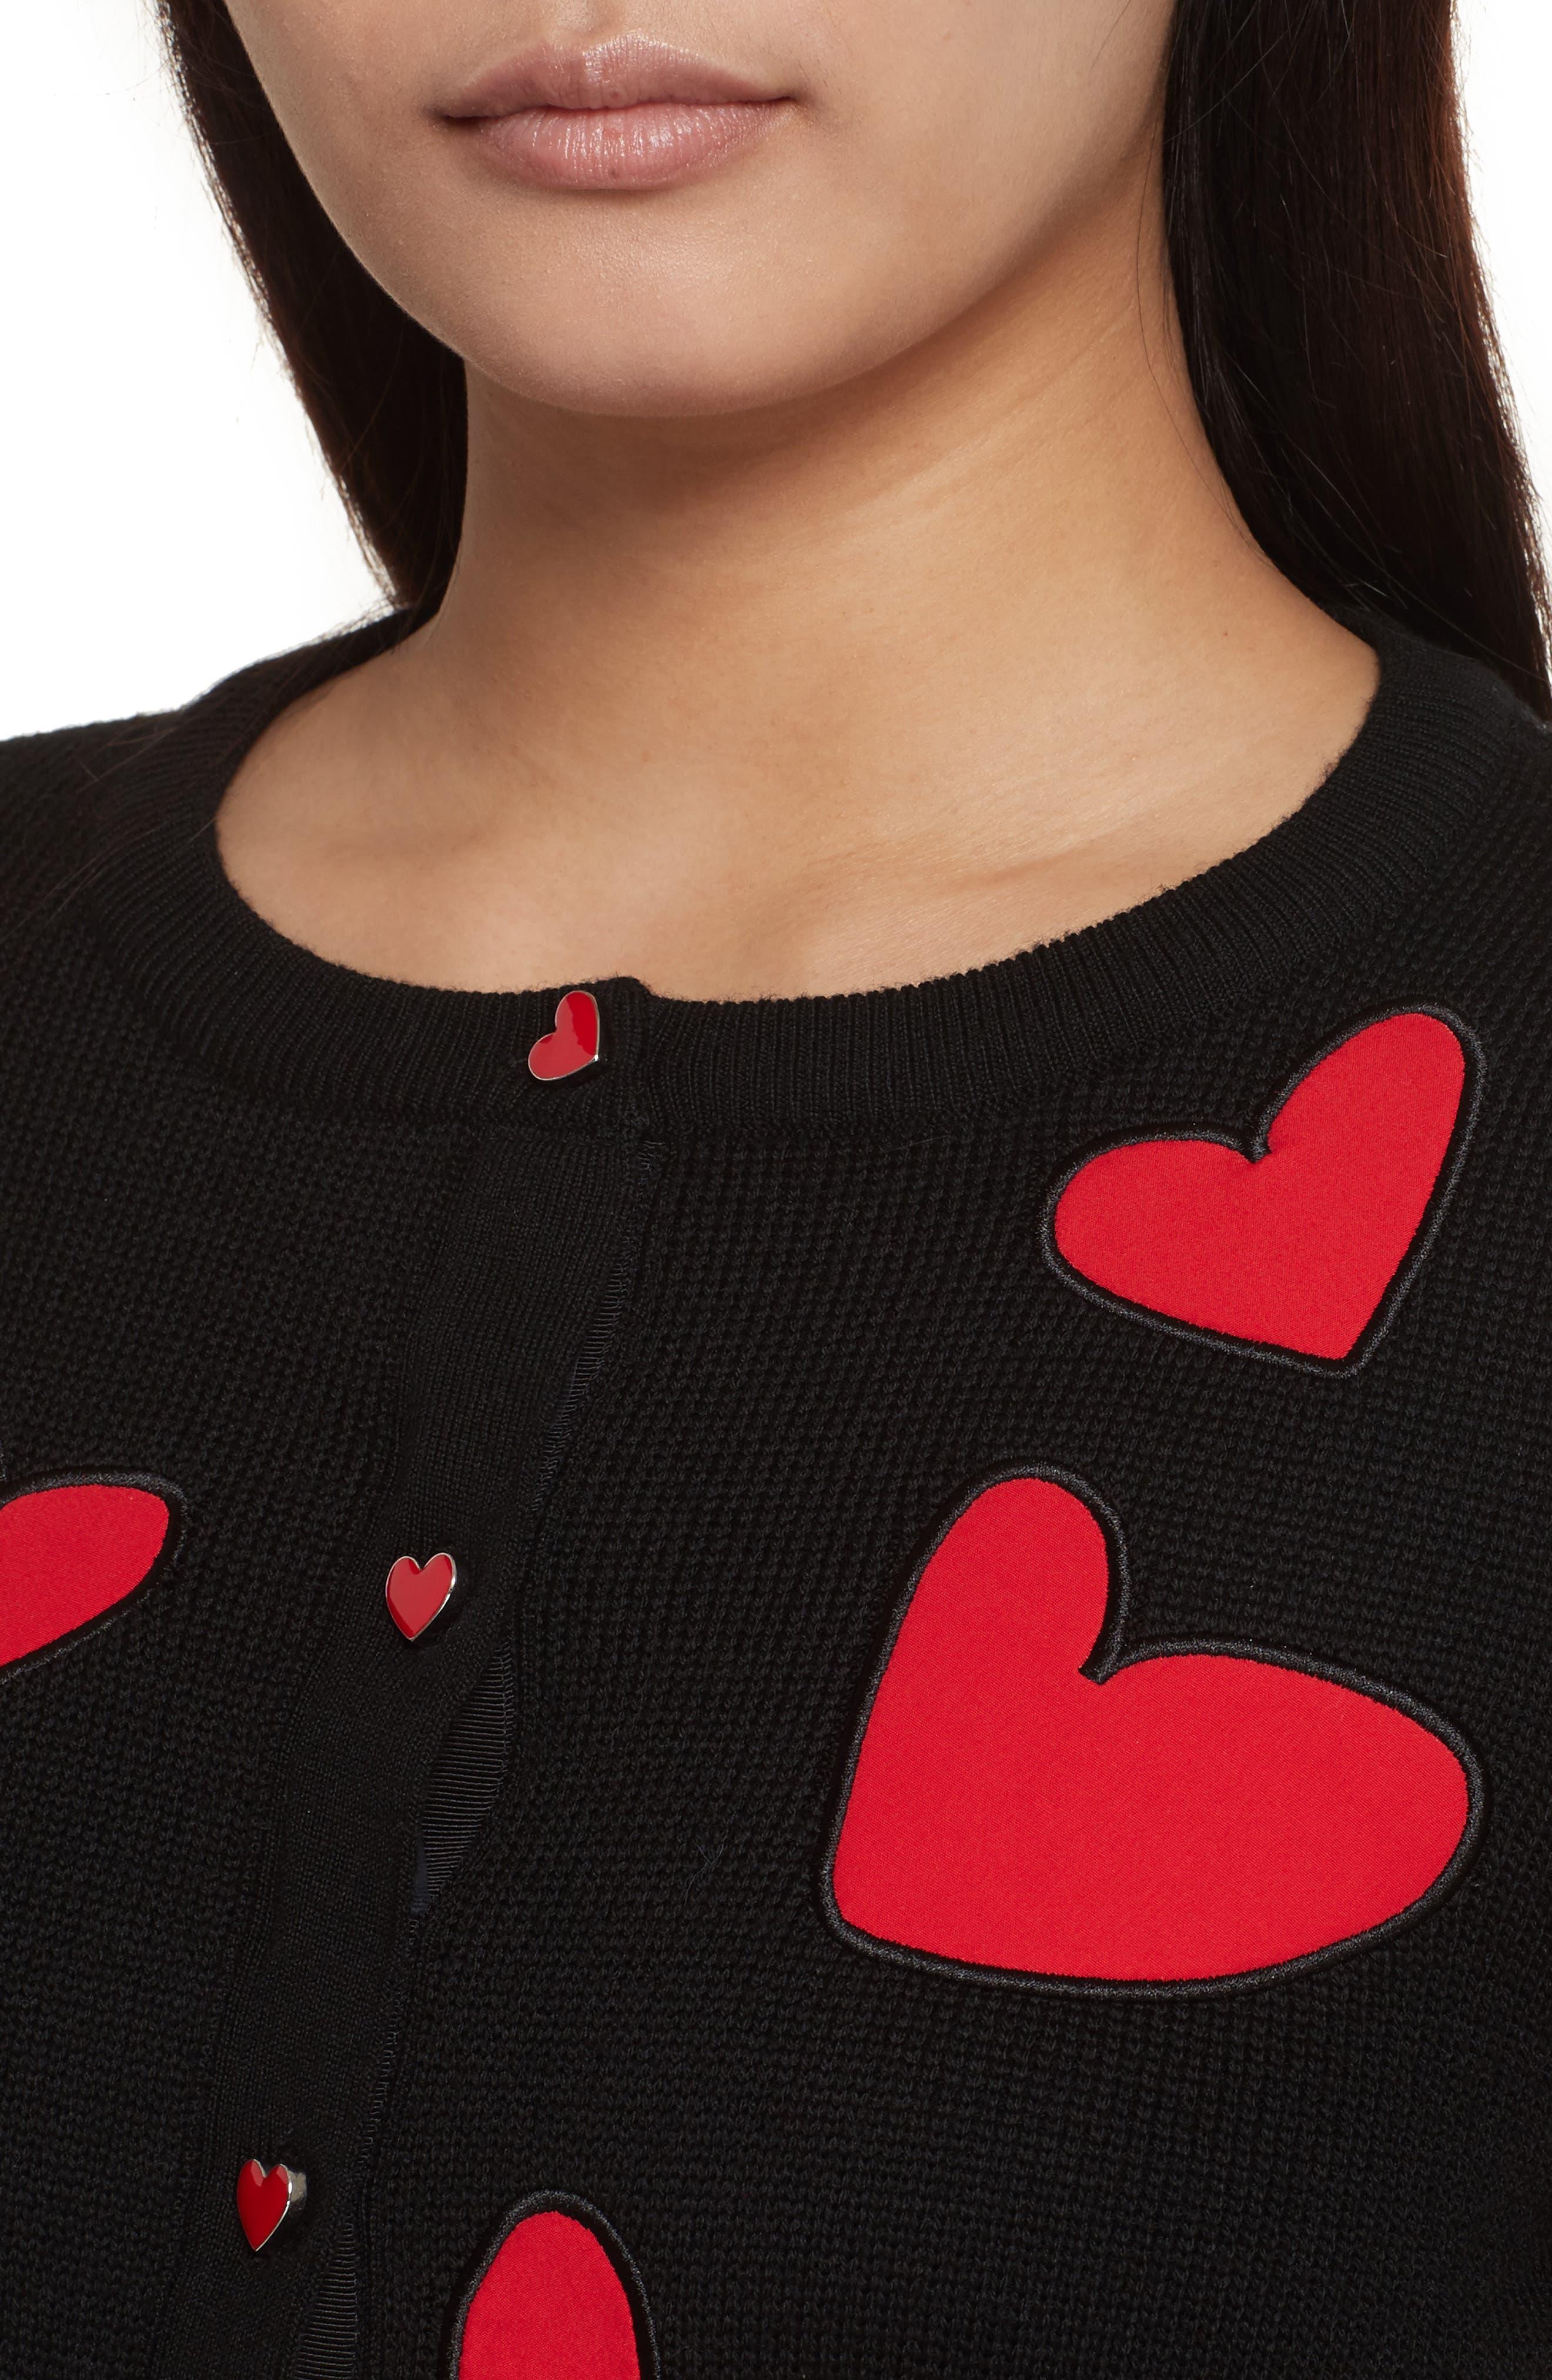 Ruthy Heart Appliqué Cardigan,                             Alternate thumbnail 4, color,                             012